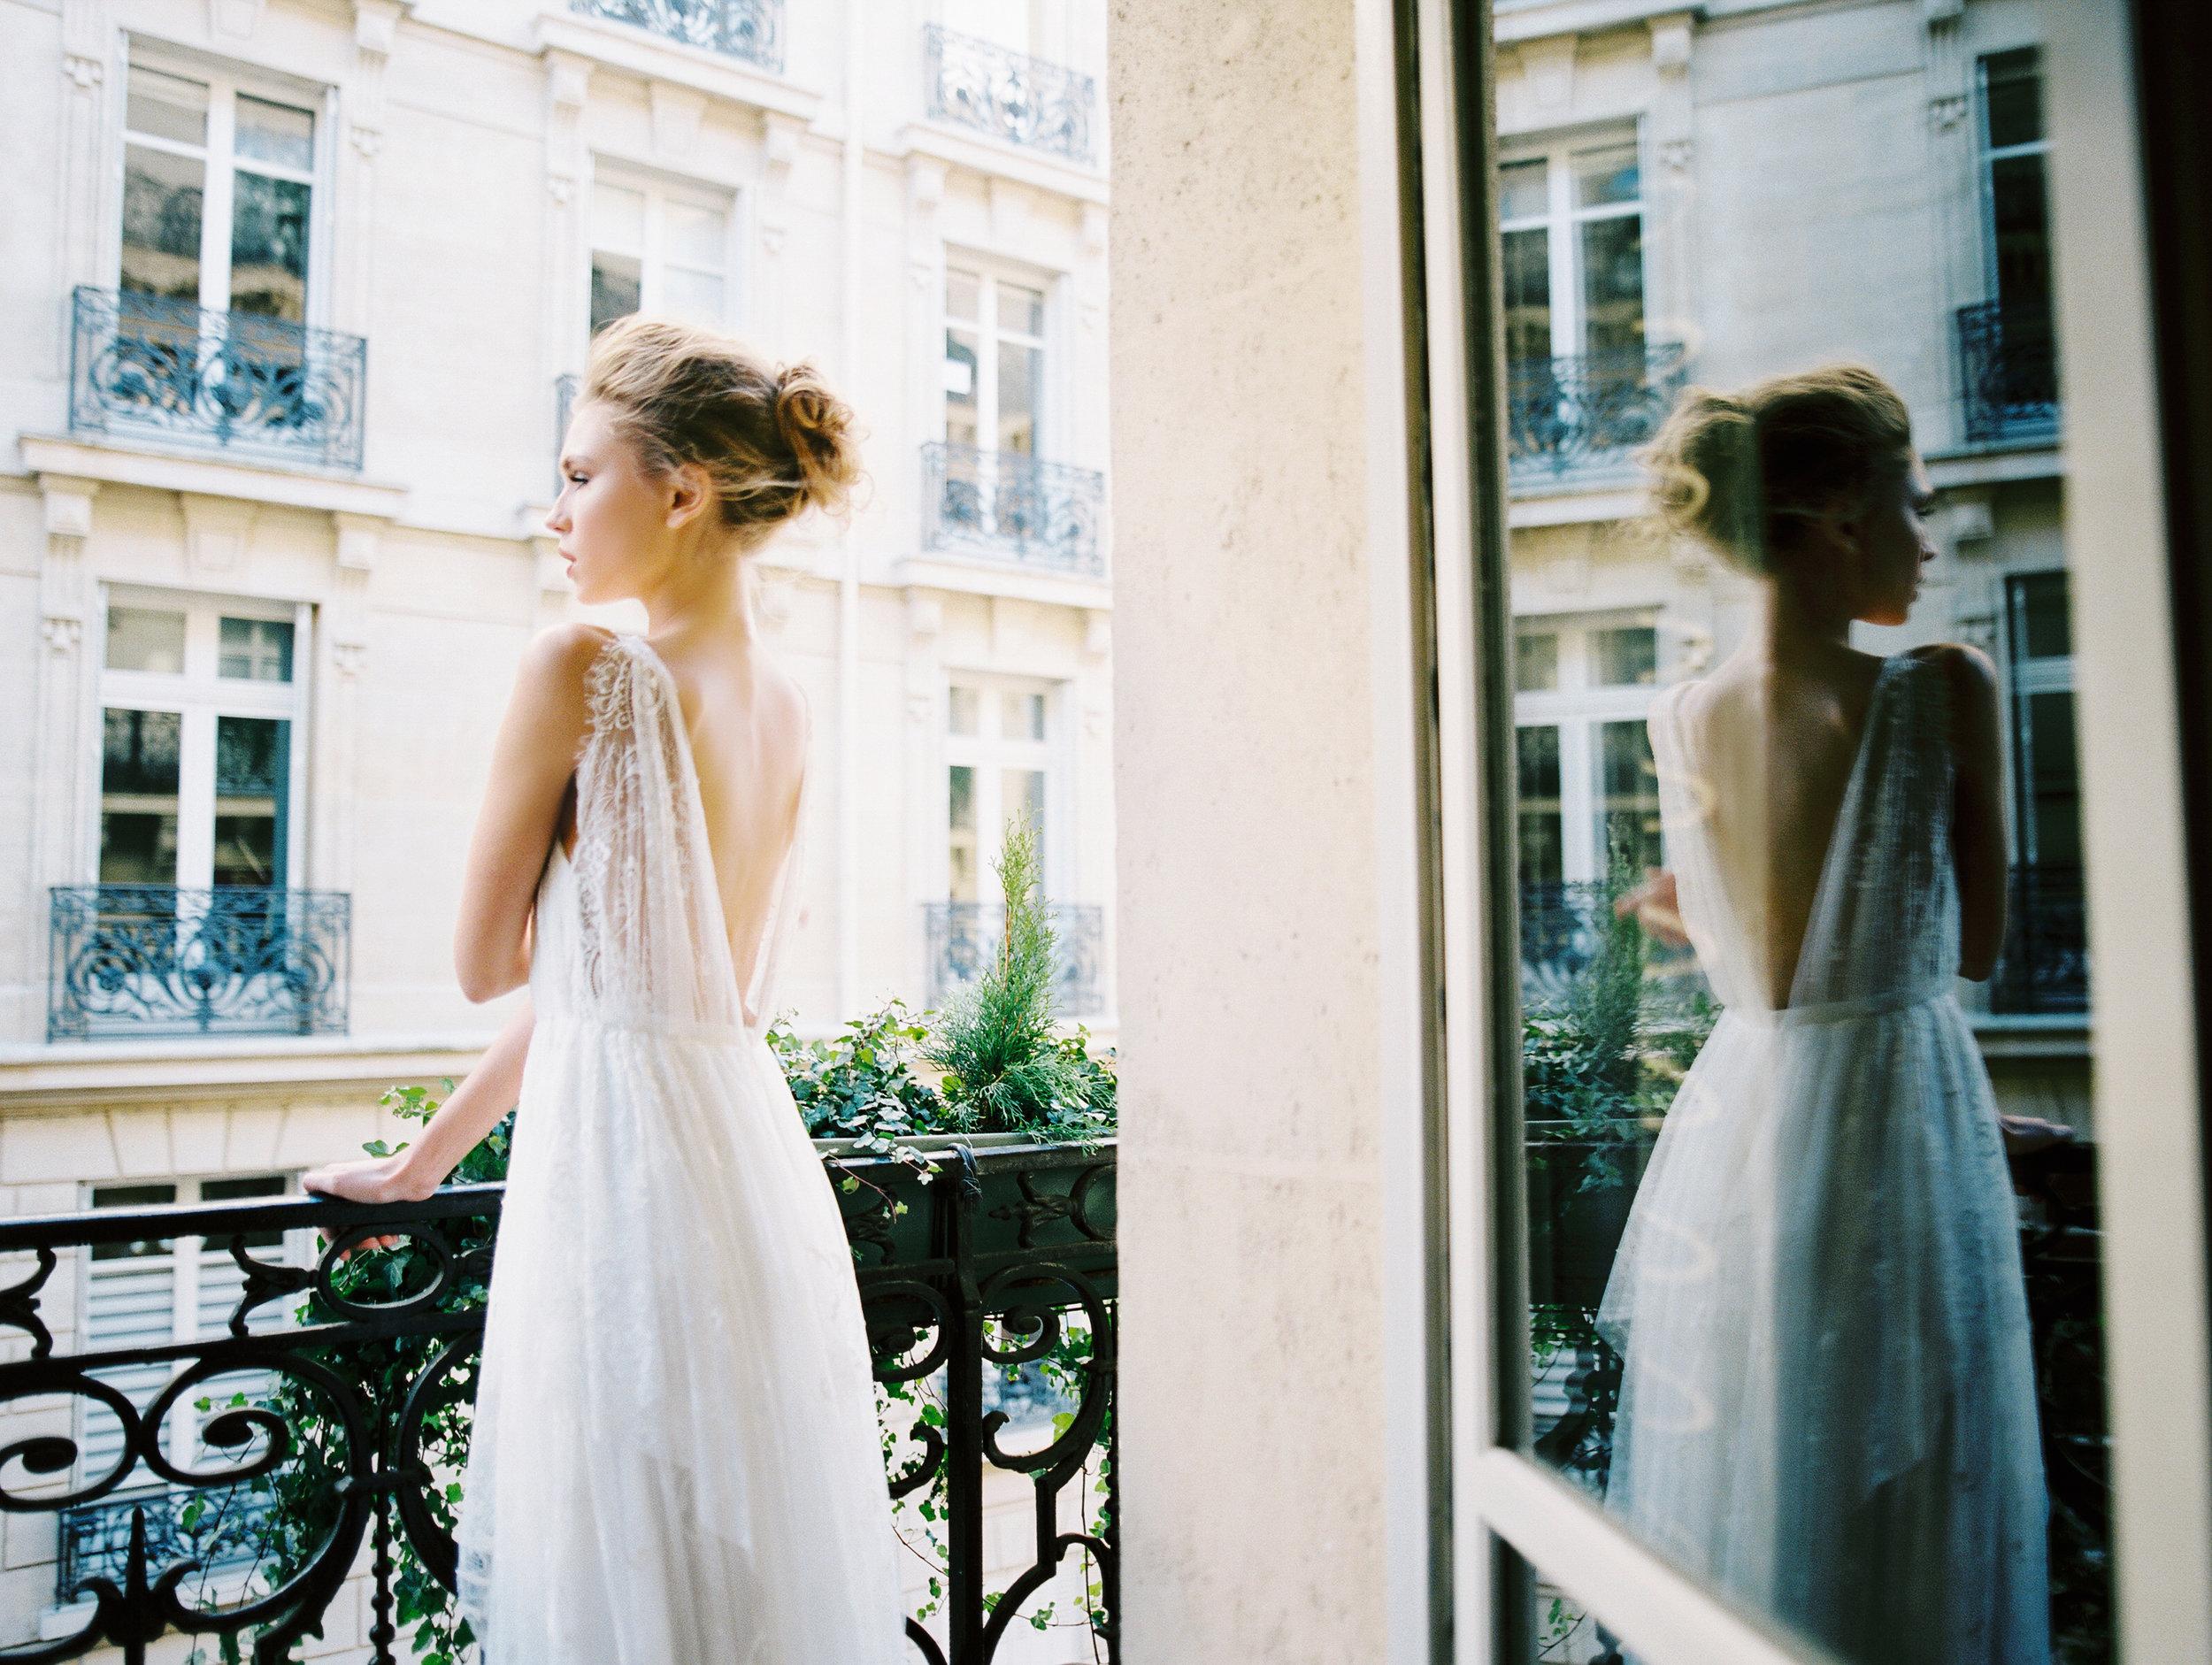 katie stoops photography-paris wedding-marchesa-cynthia martyn events09.jpg